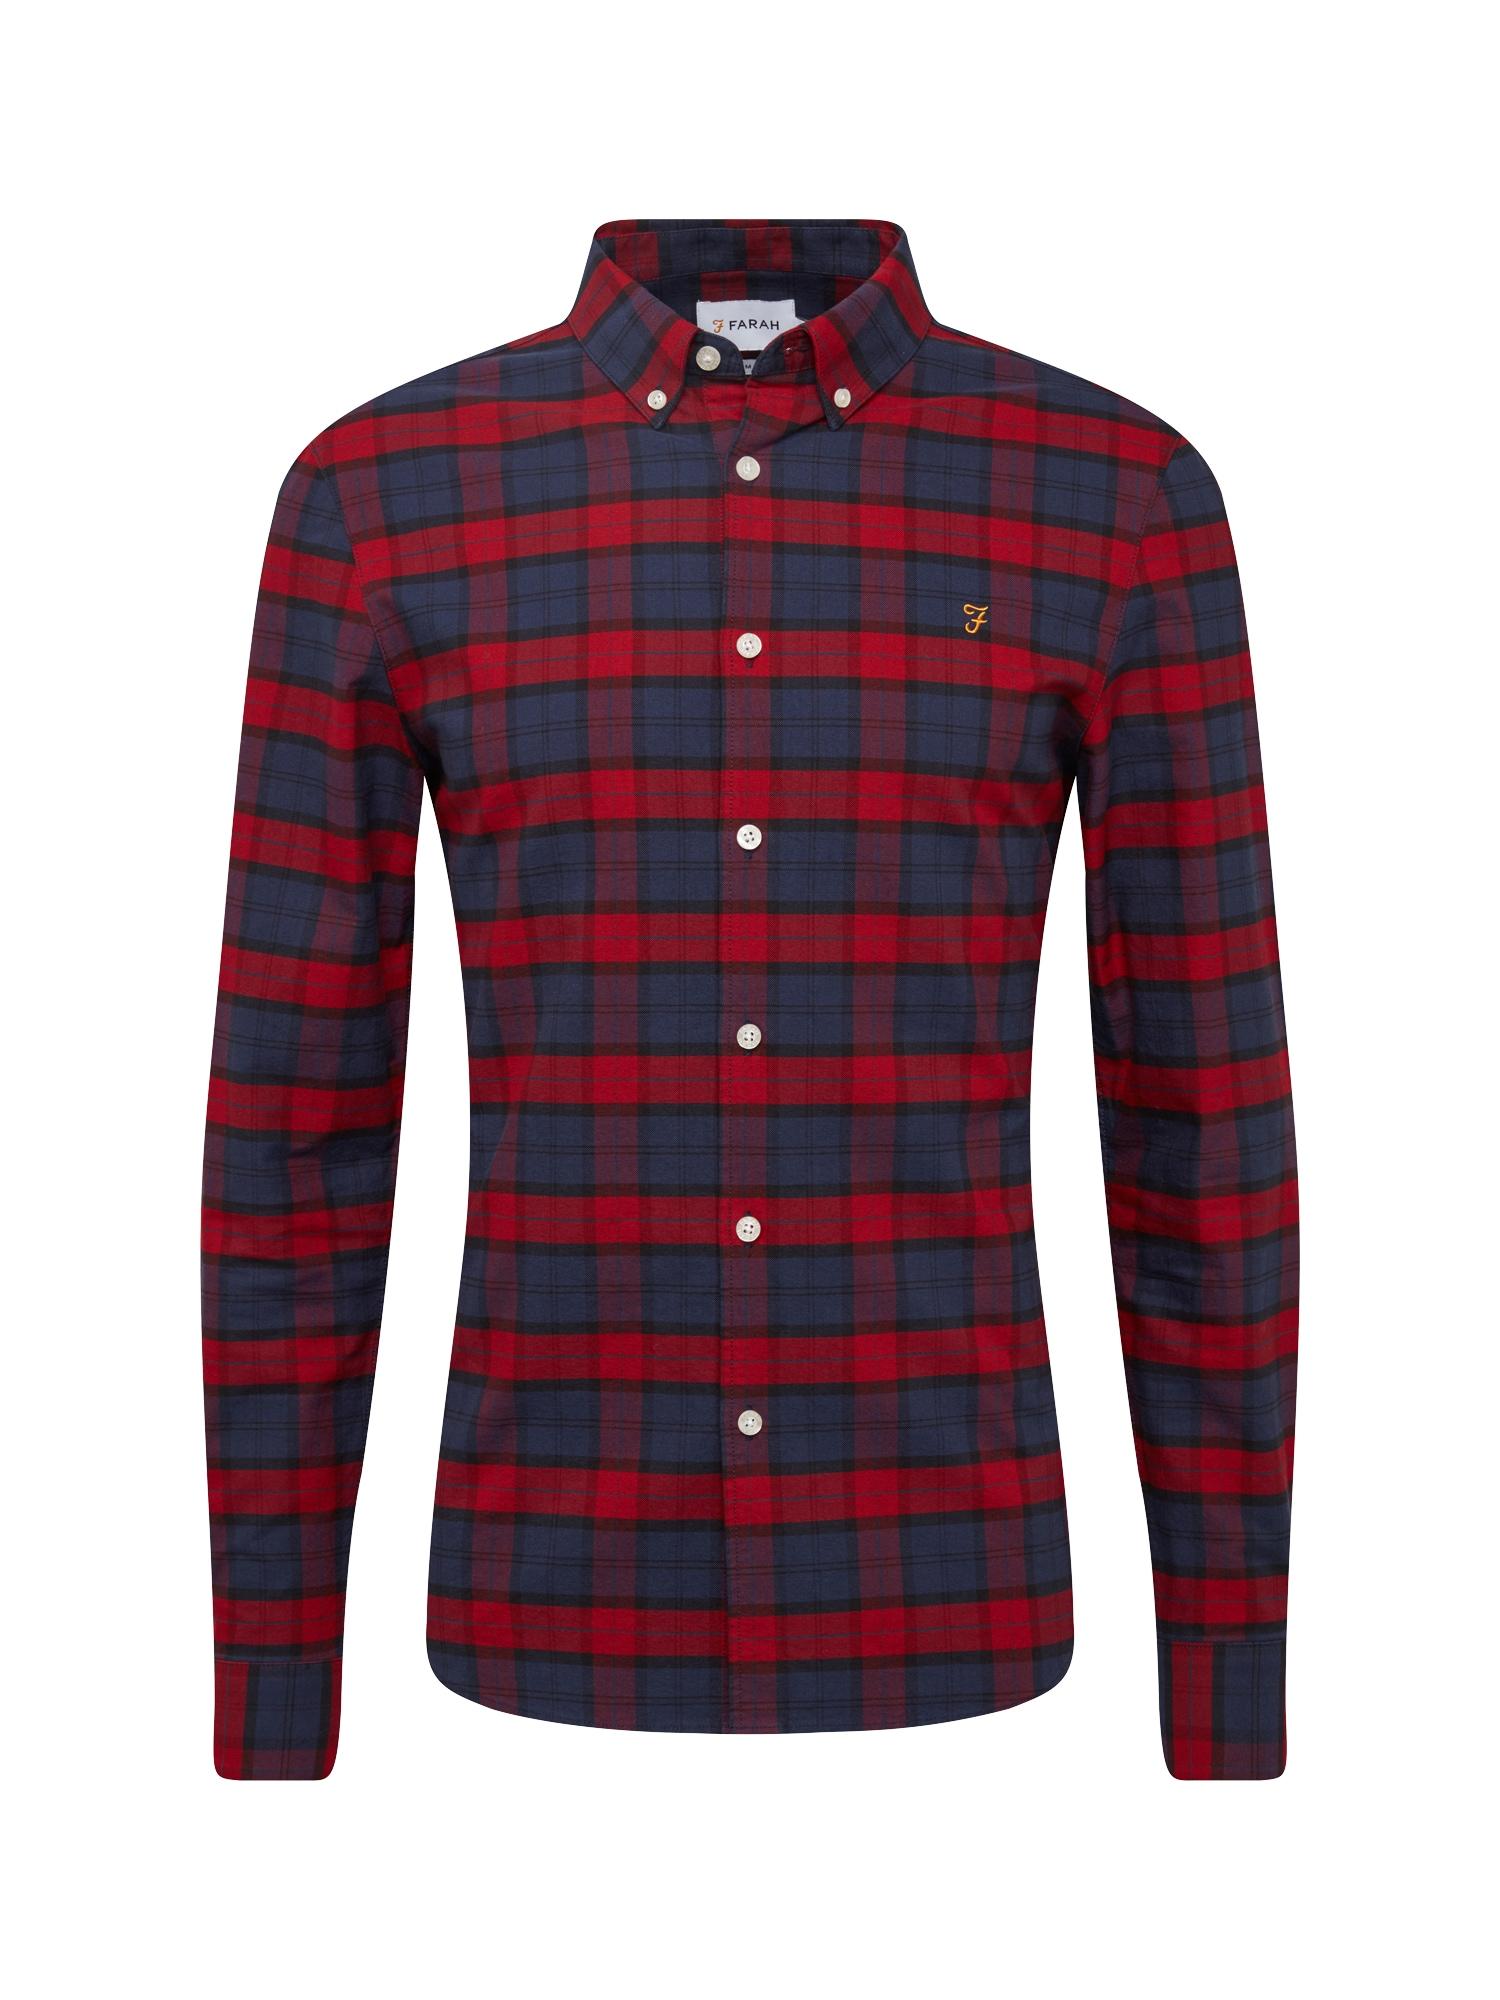 Košile BREWER CHECK tmavě modrá červená FARAH